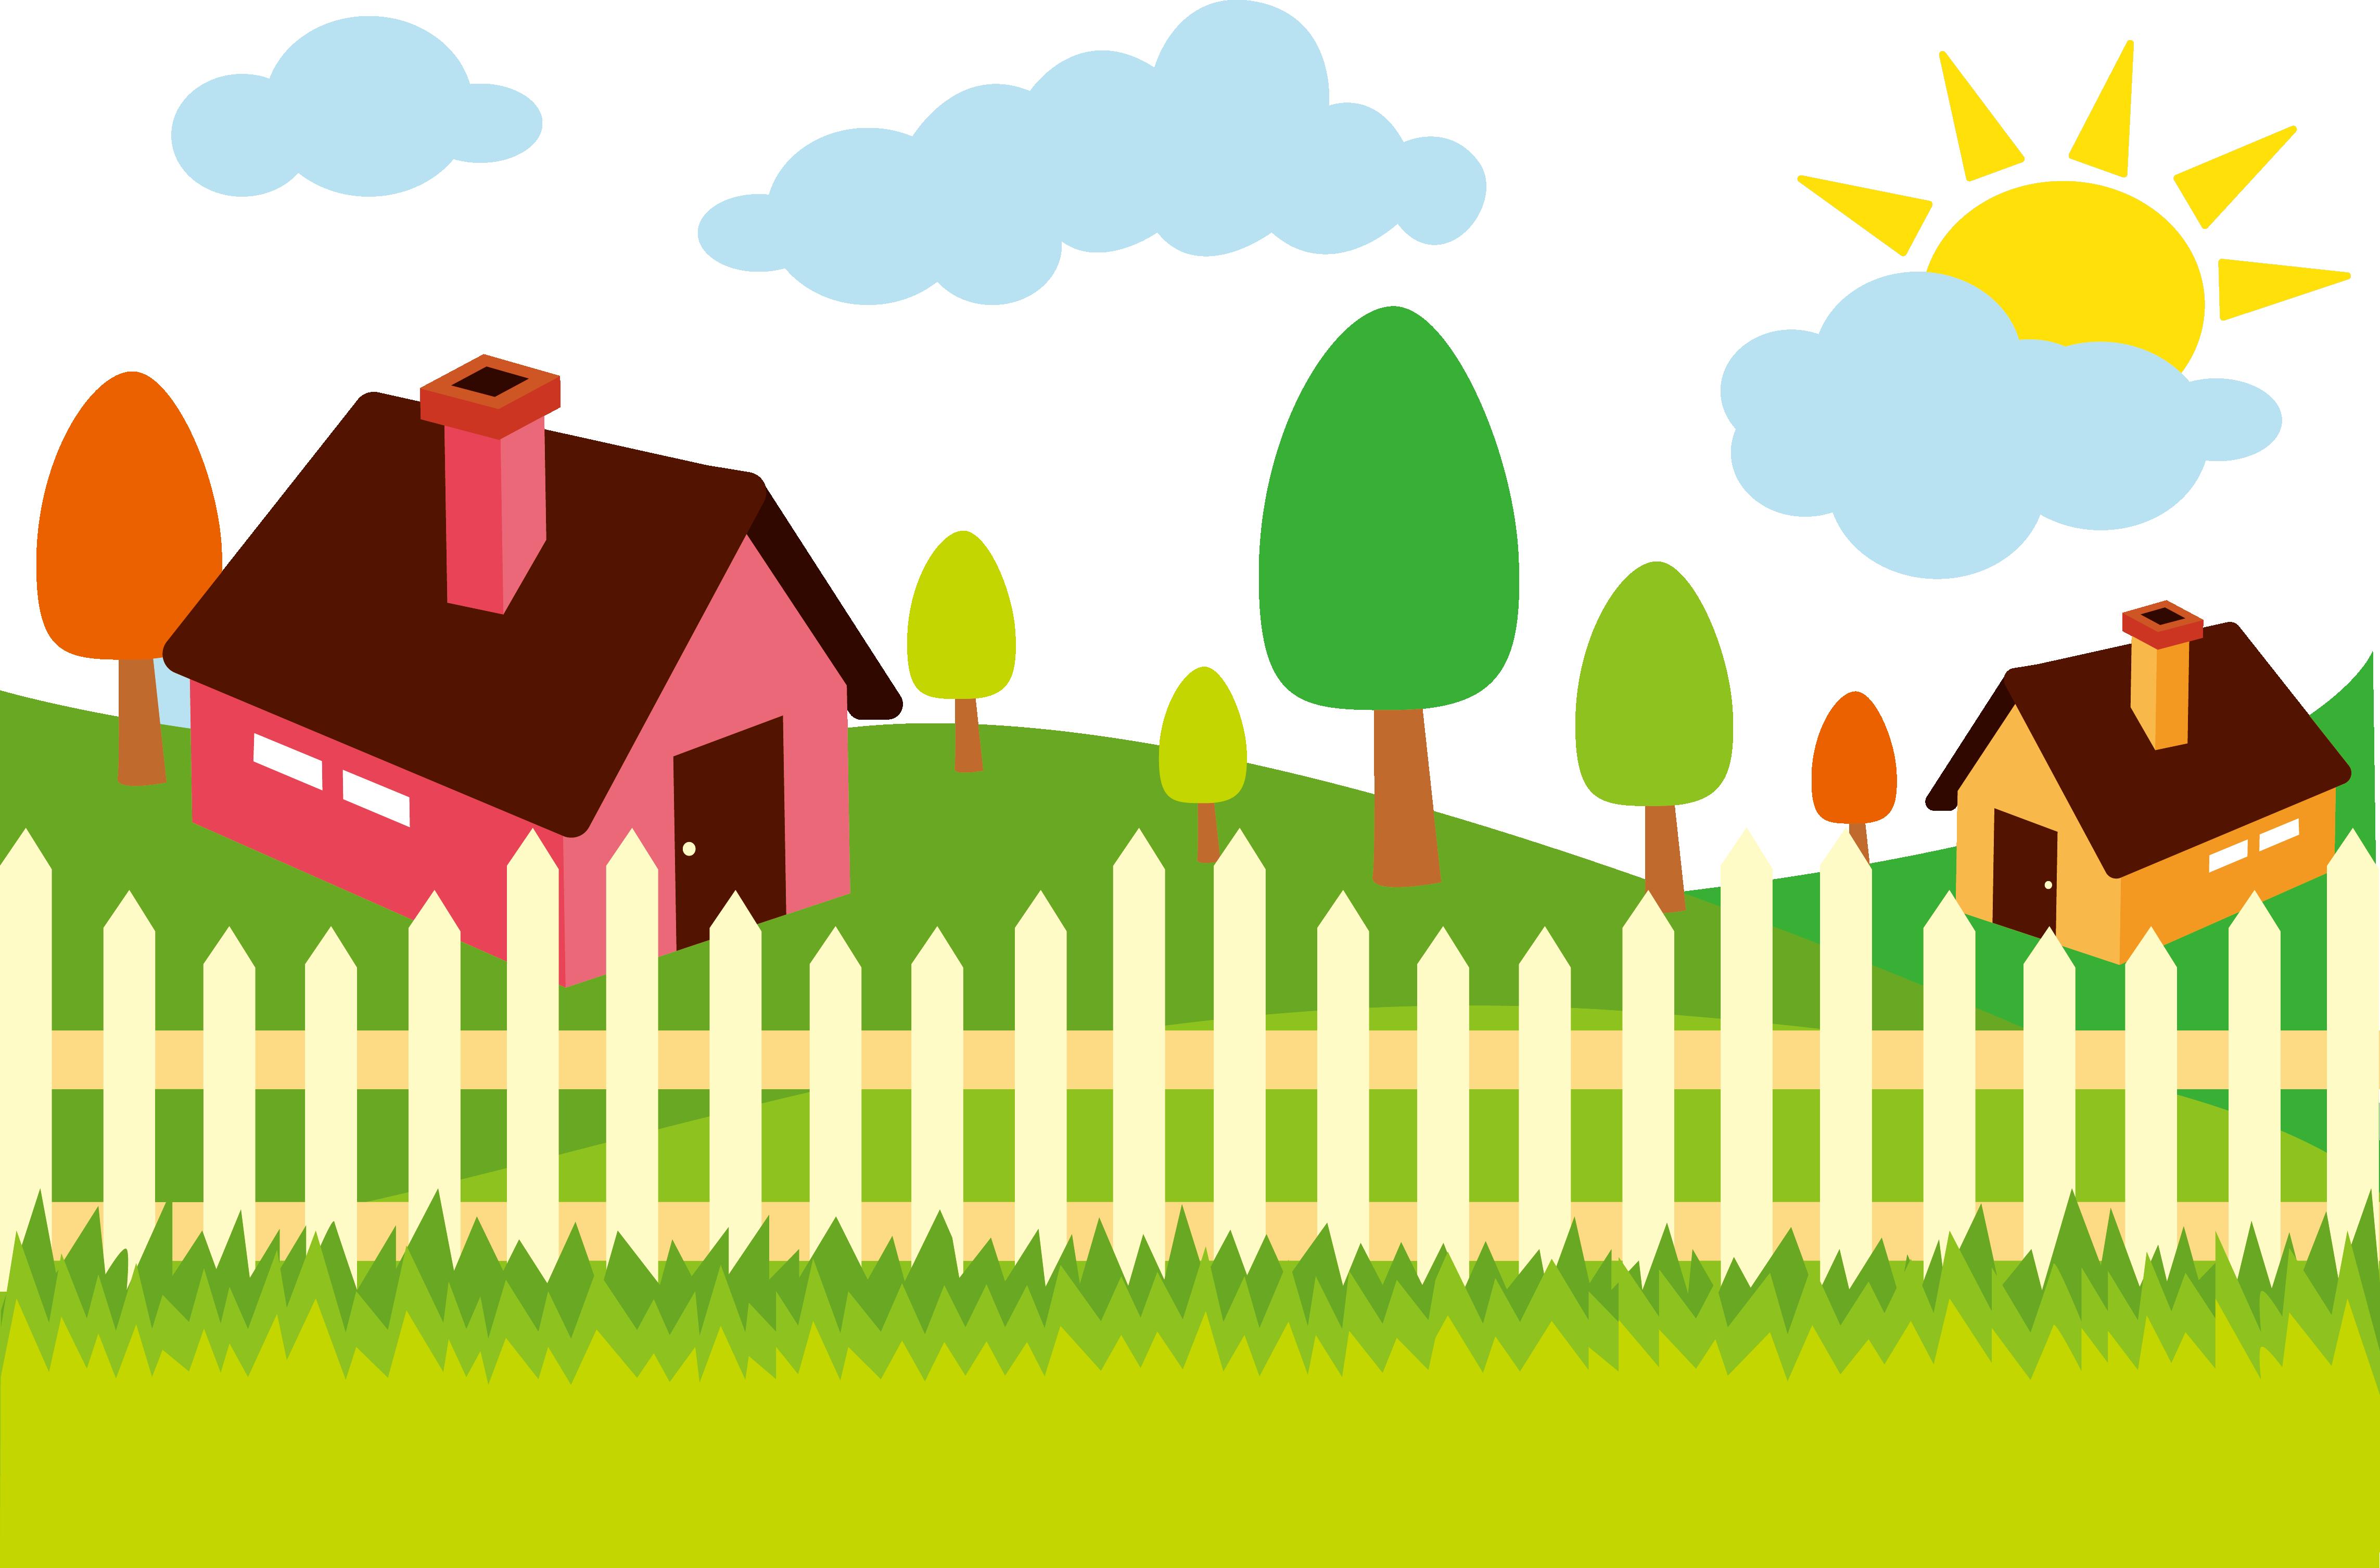 Adobe illustrator illustration pastoral. Fencing clipart painting fence